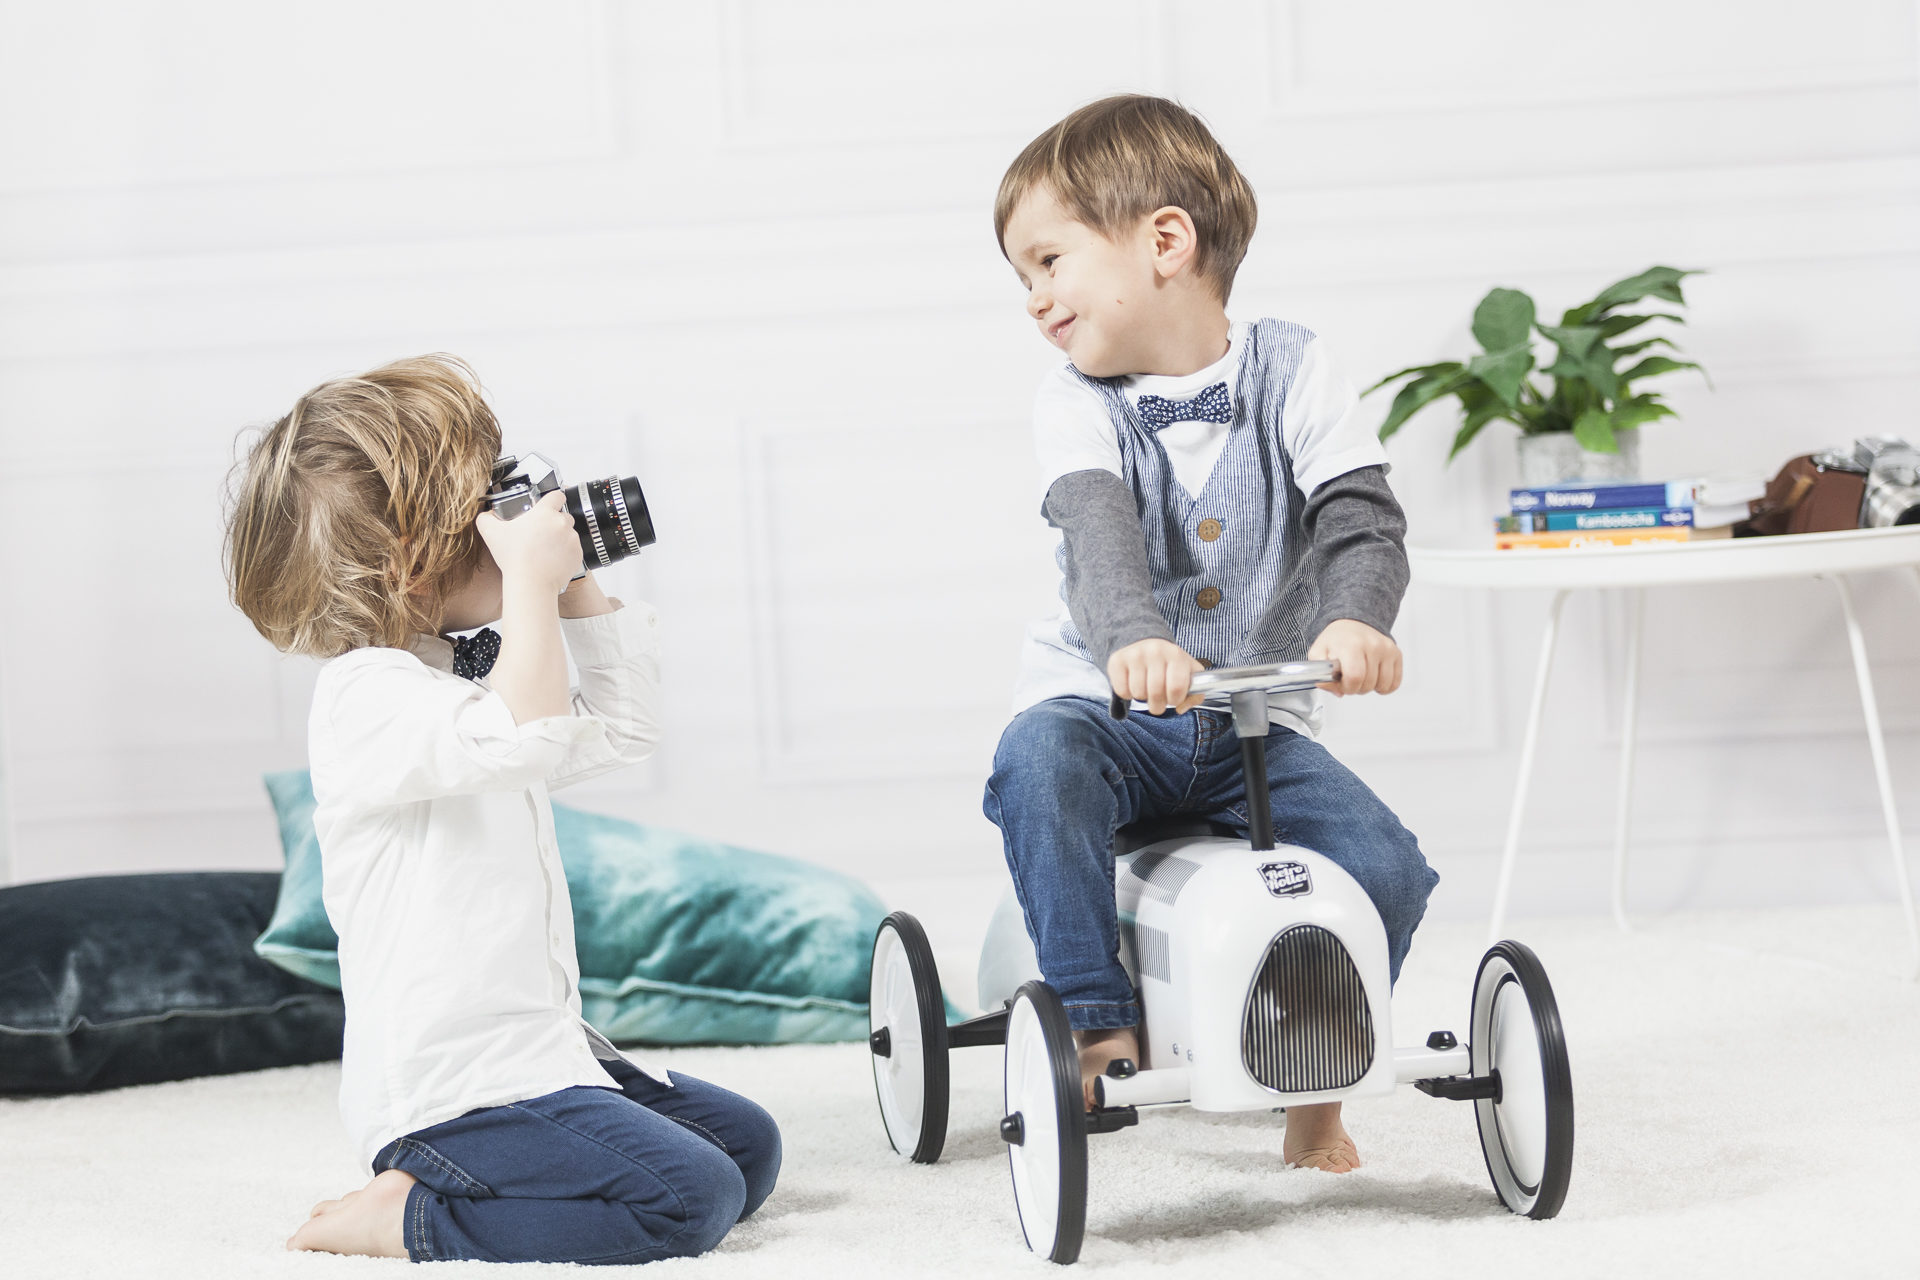 galerie-littlephotographers-20-kindergartenfotografie